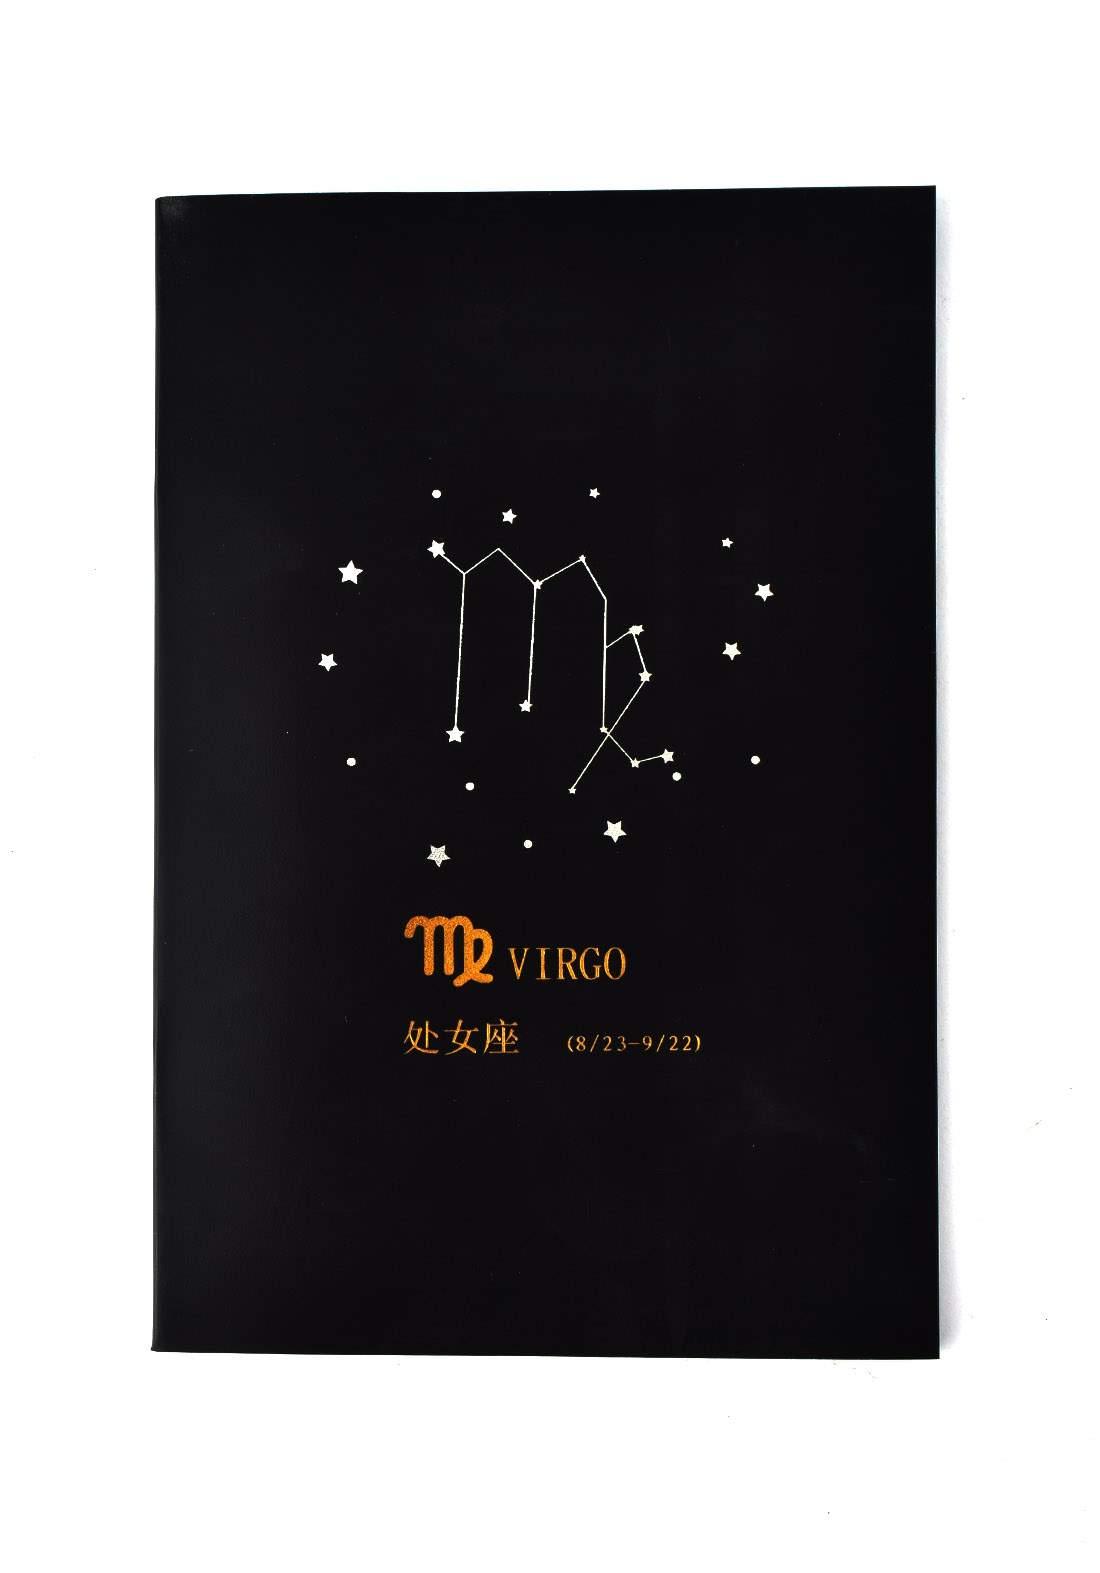 Big Black Drawing Book 24 Sheets-Virgo دفتر رسم اسود كبير بطبعة برج العذراء